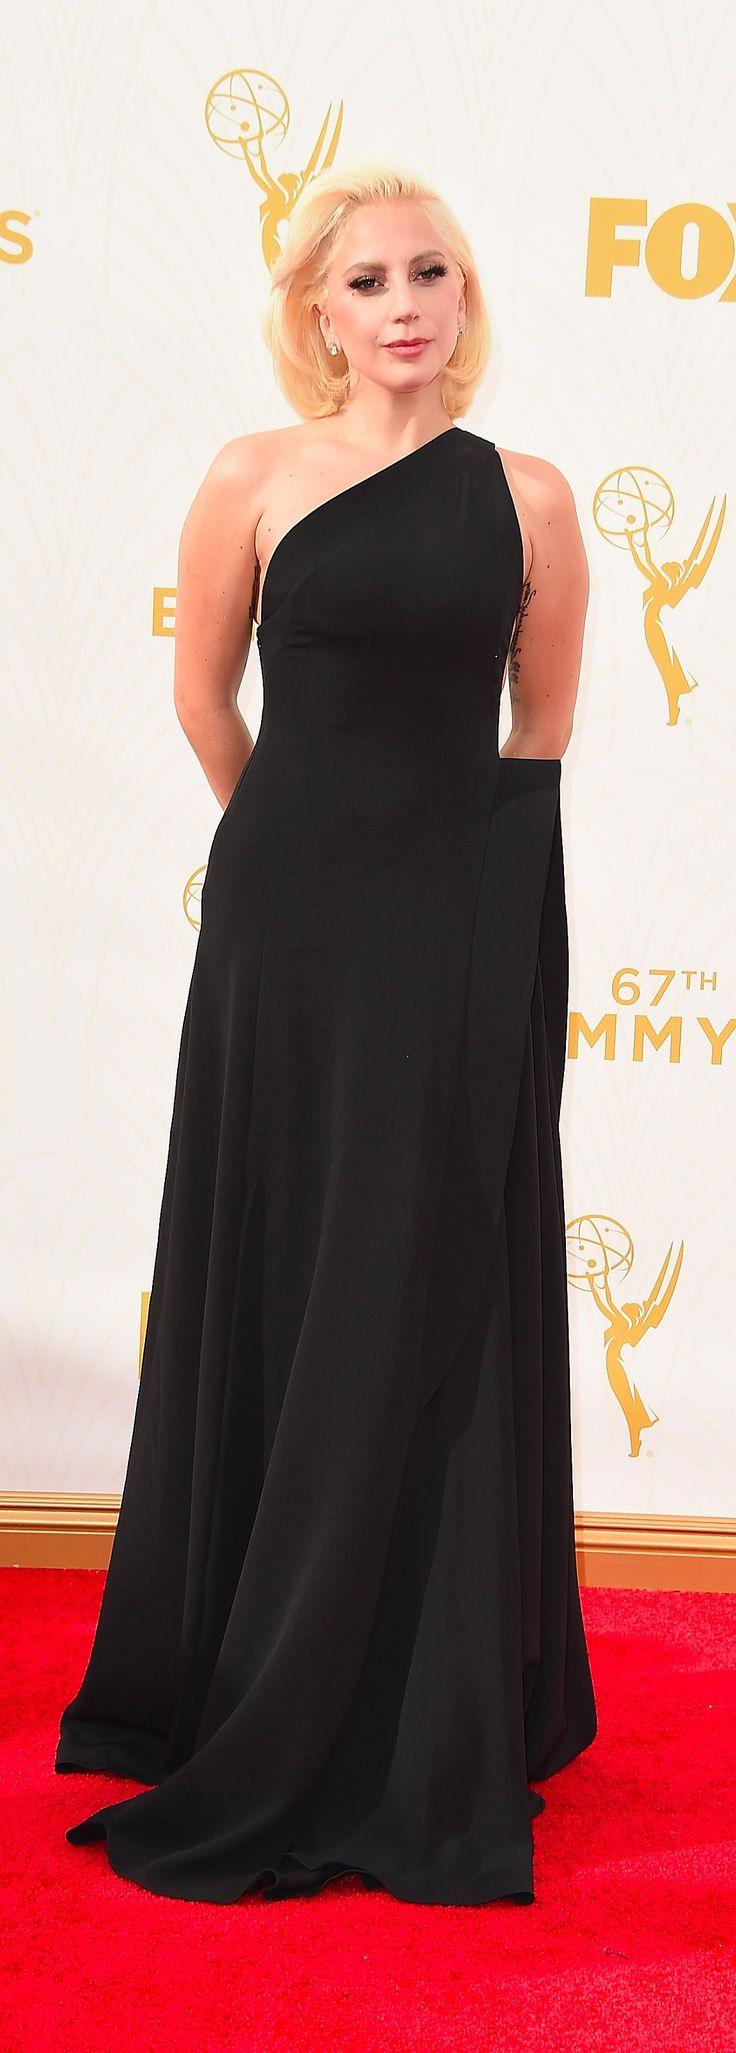 Lady Gaga at the Emmy Awards 2015